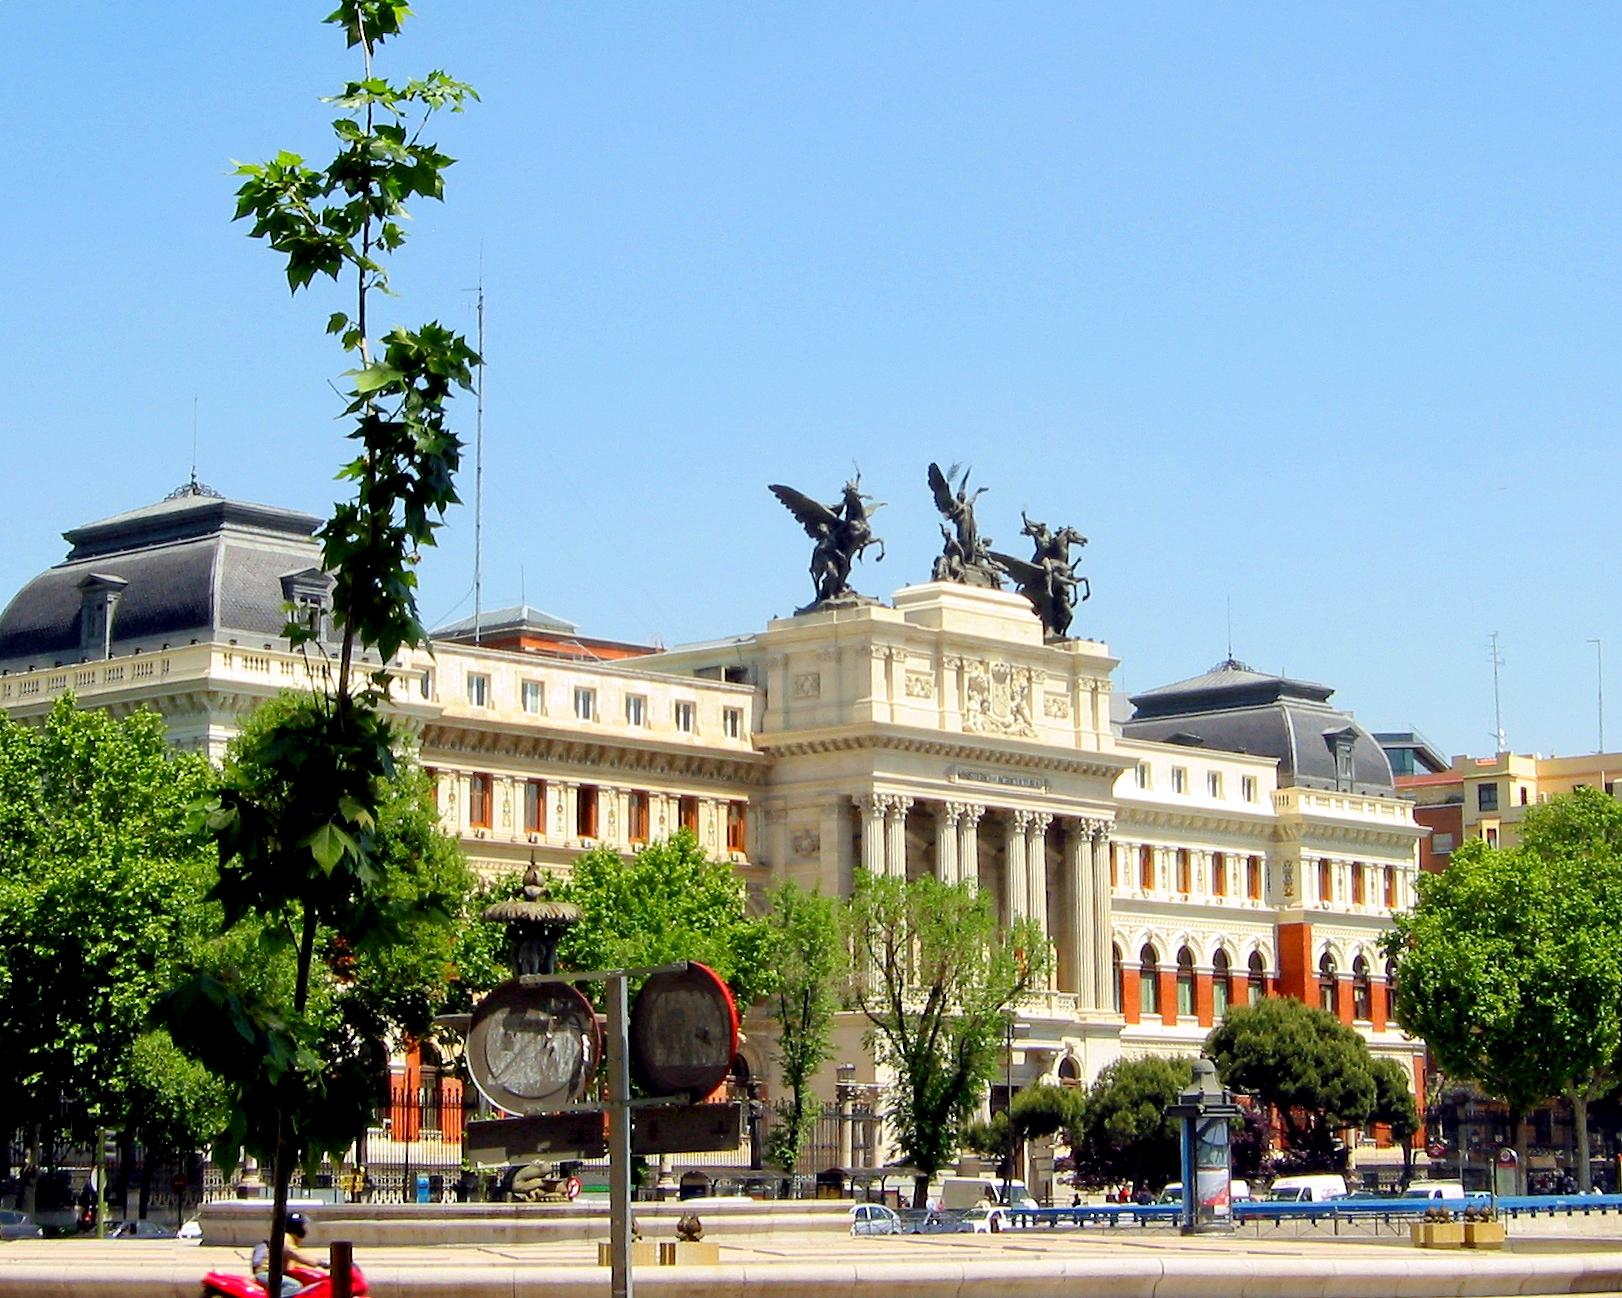 Ministerio_de_Agricultura_(Madrid)_01.jp